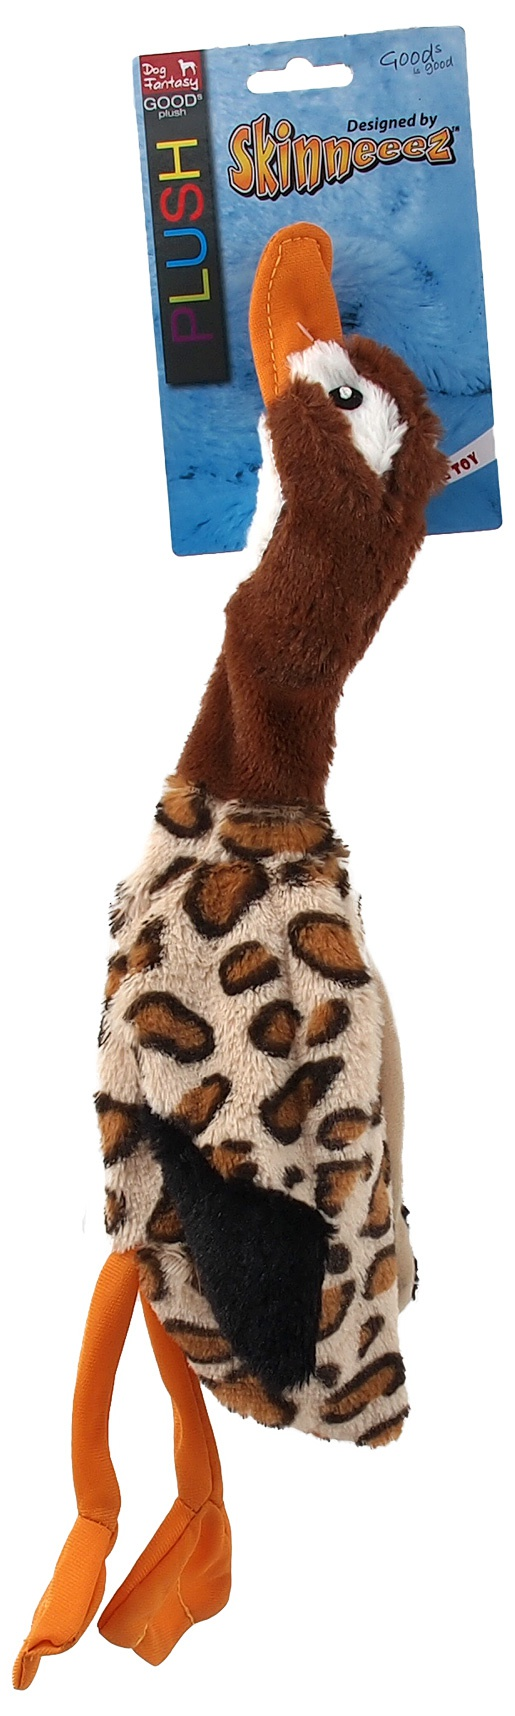 Rotaļlieta suņiem - Dog Fantasy Good's Skinneeez duck, 40 cm